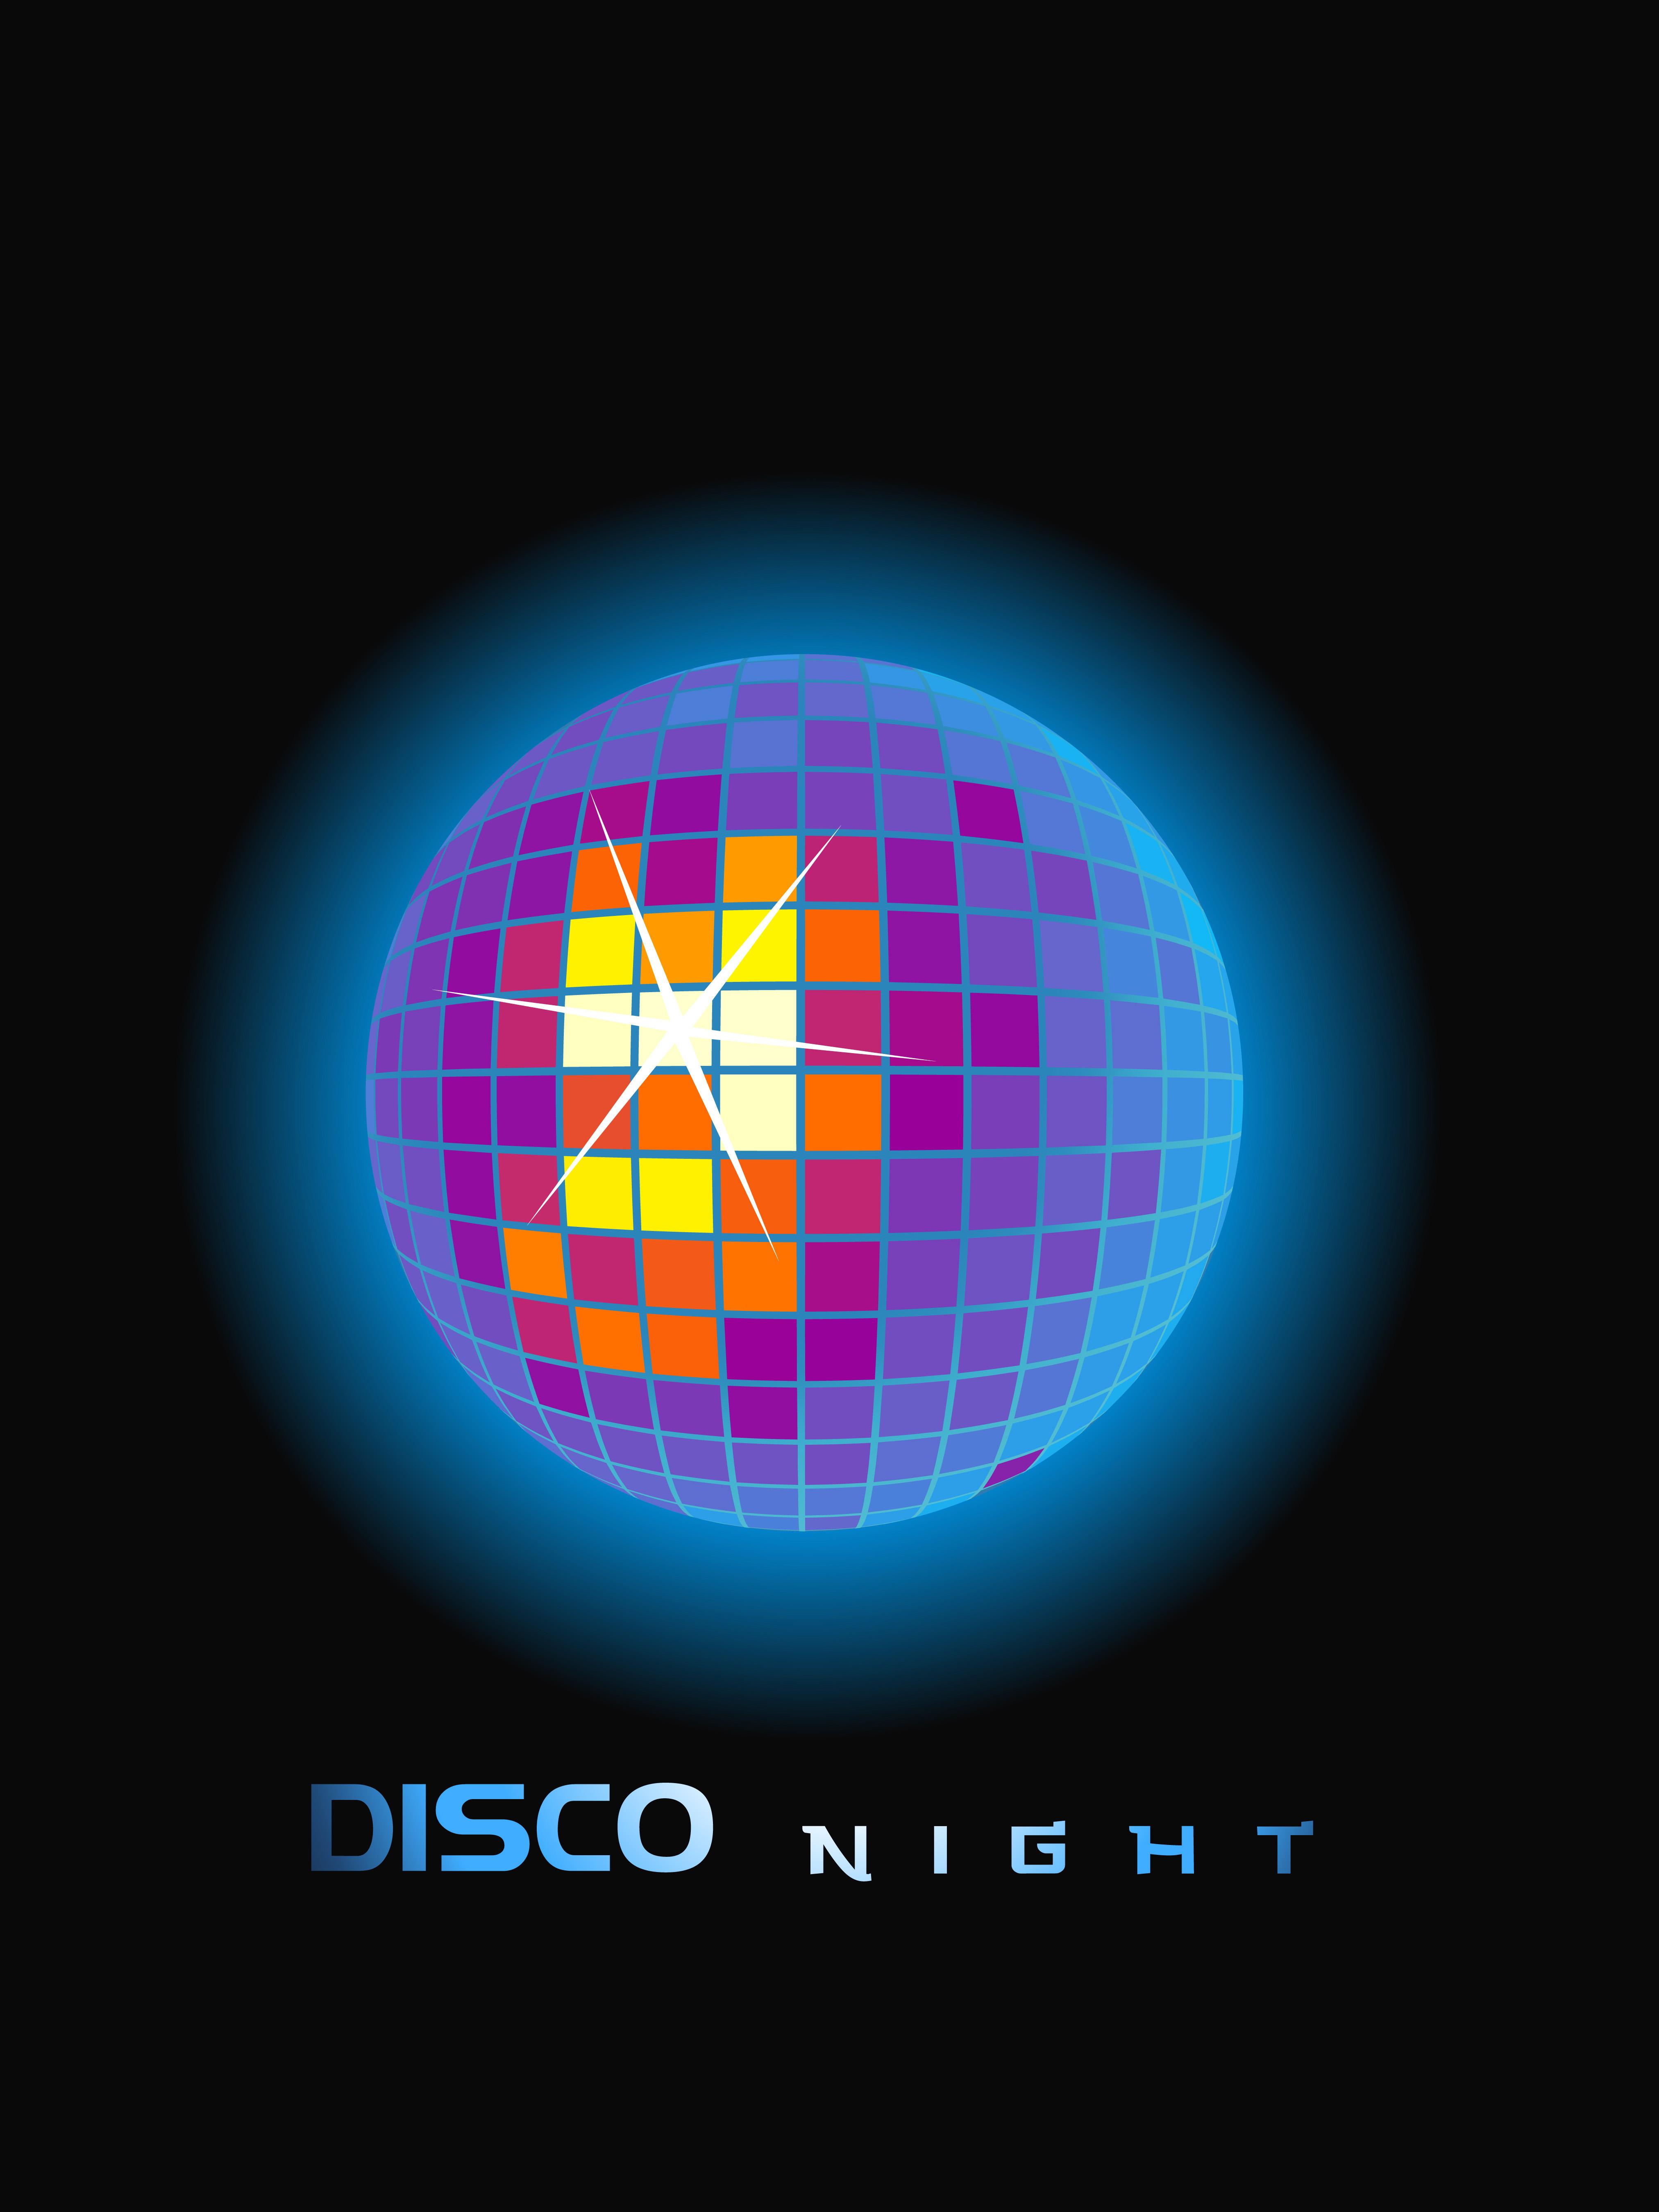 Disco Lights Free Vector Art 6697 Free Downloads